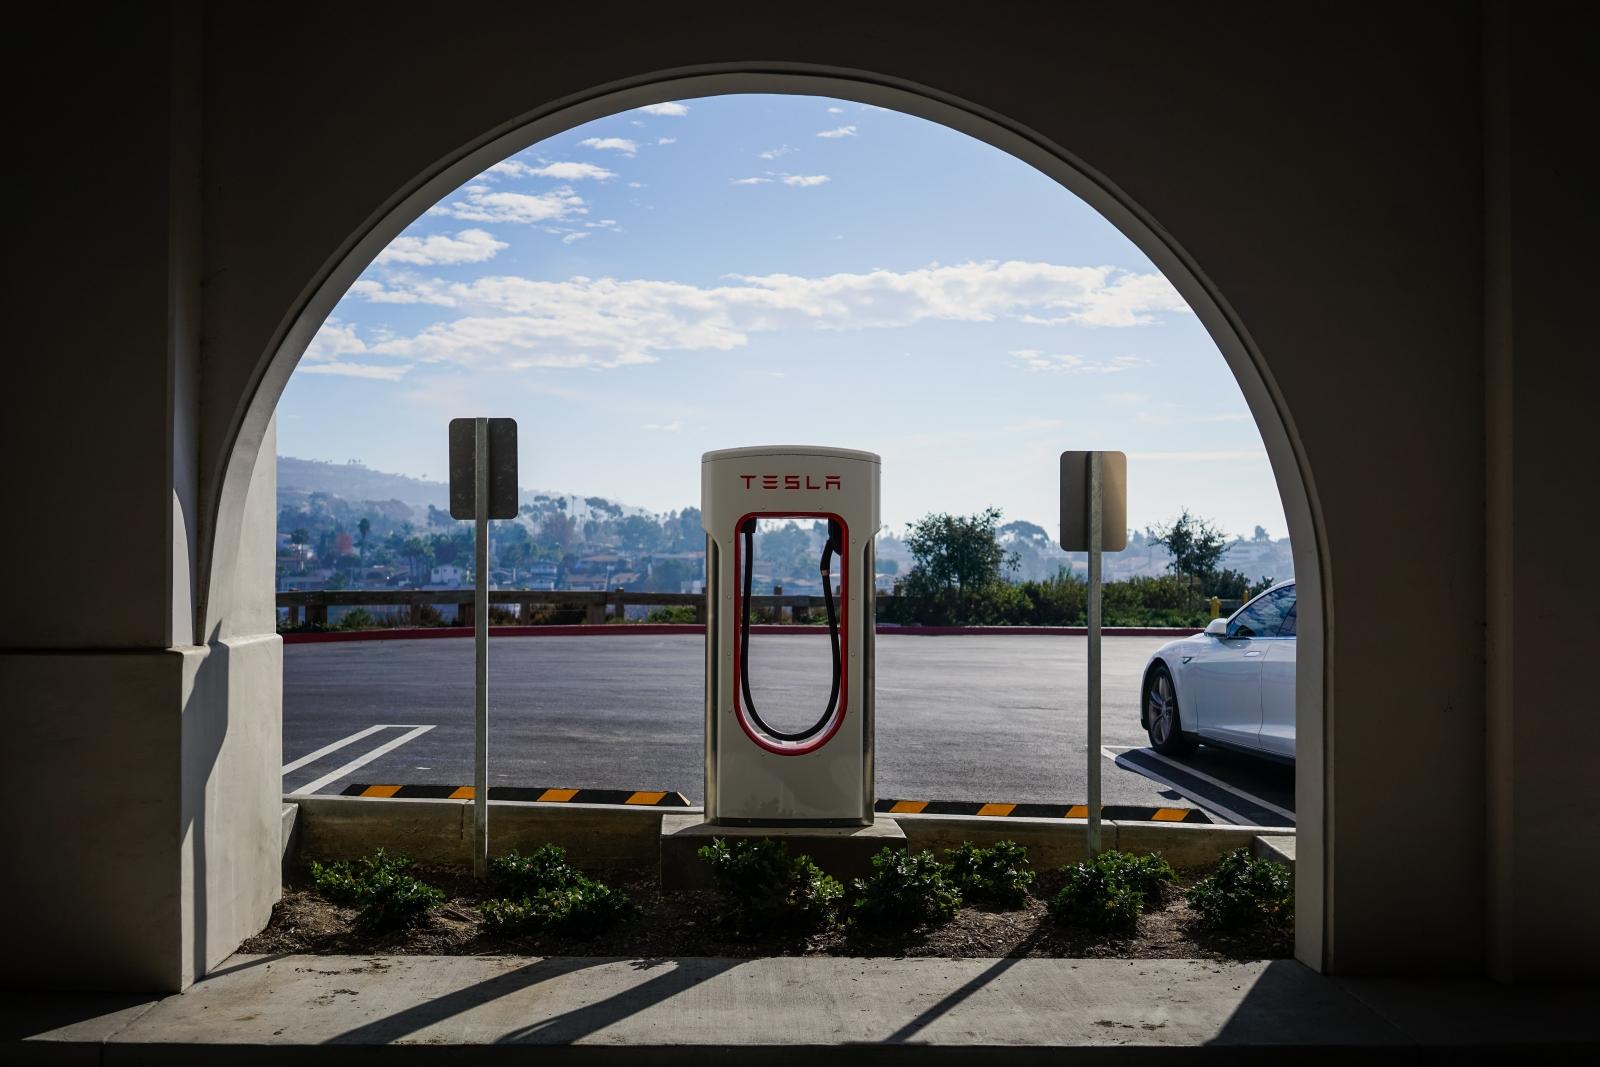 Čy gotova ukraїnśka infrastruktura do «bumu» elektromobiliv?